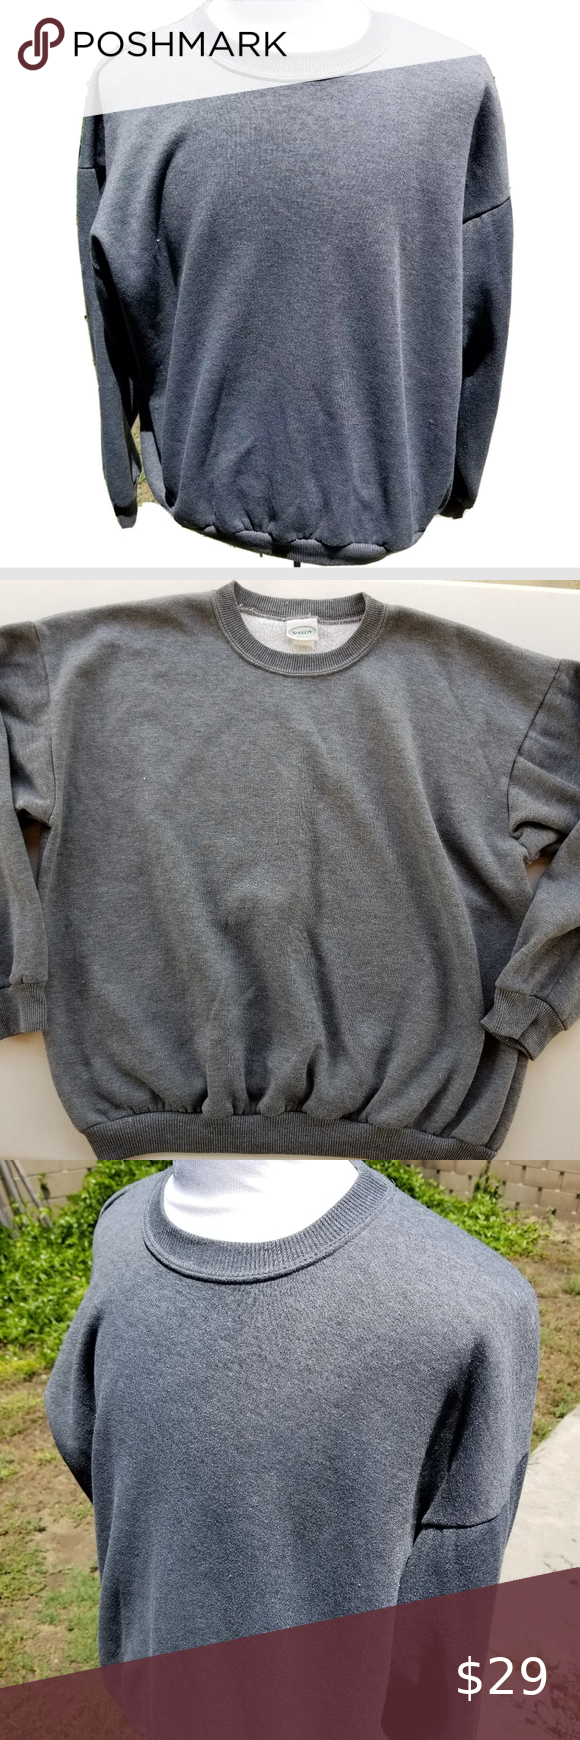 Vintage 90s Speedy Usa Soft Crewneck Sweatshirt Crew Neck Sweatshirt Sweatshirts Sweatshirt Shirt [ 1740 x 580 Pixel ]